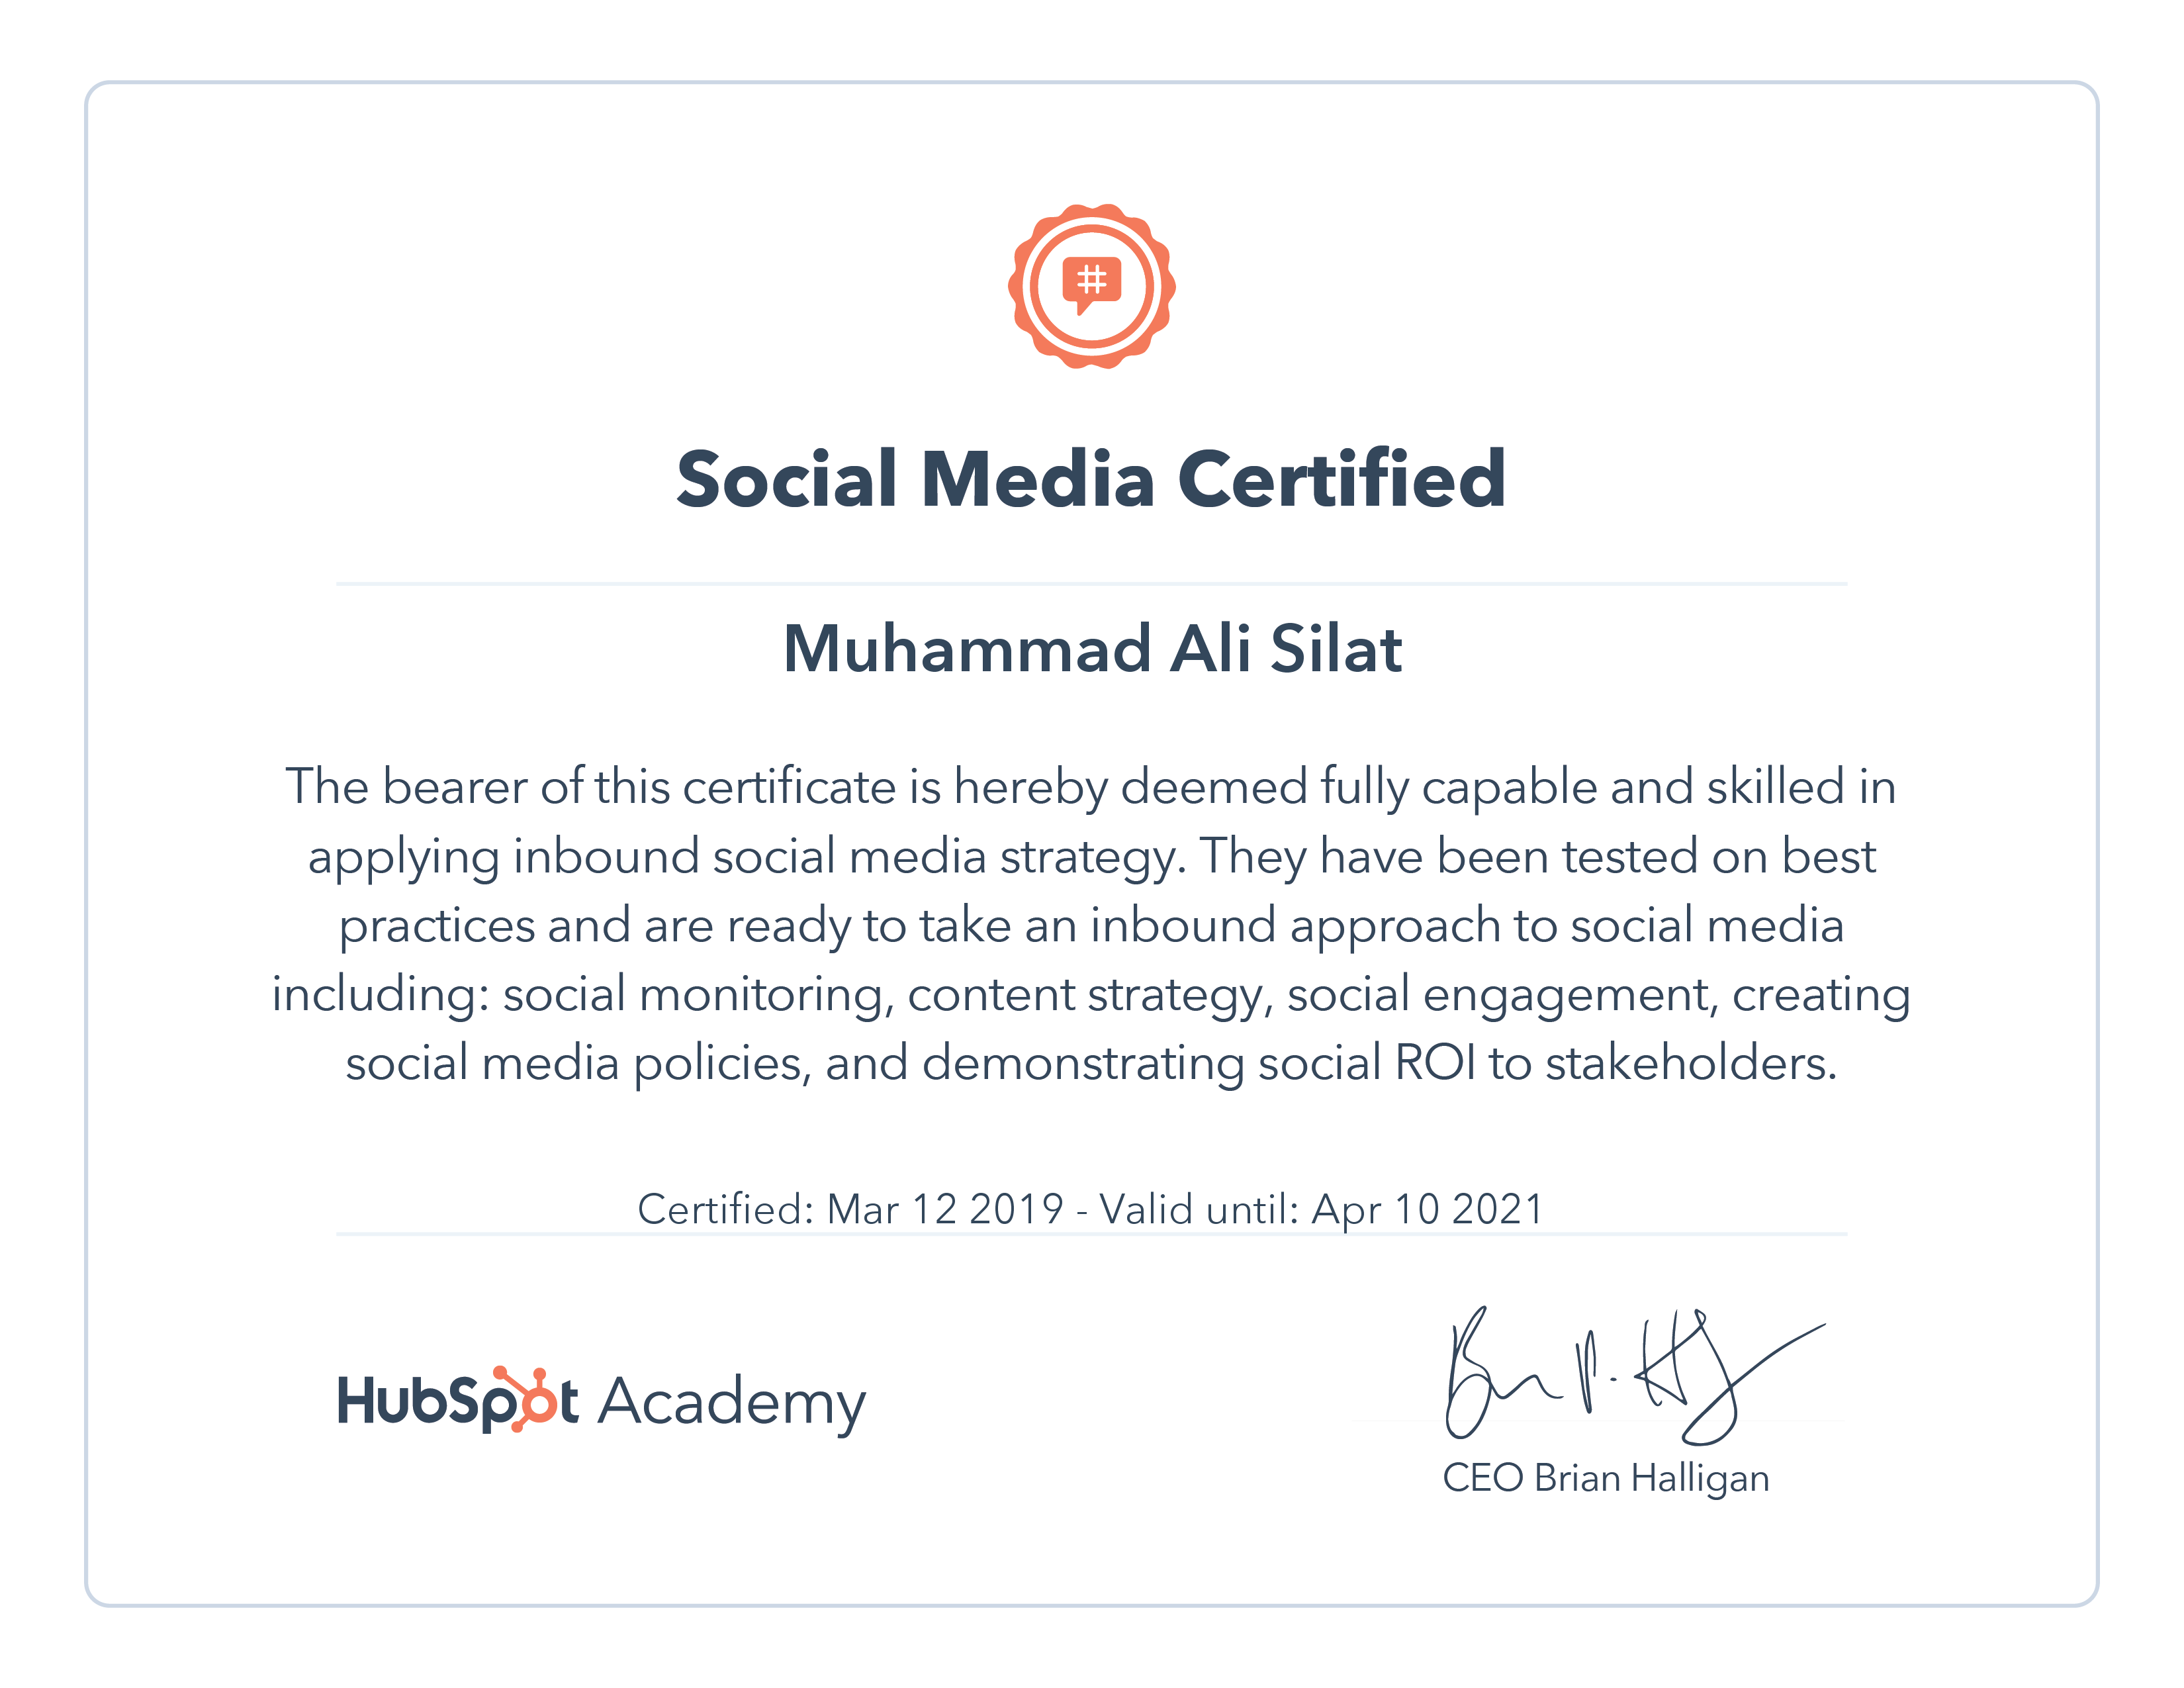 Social-Media-Certified.png